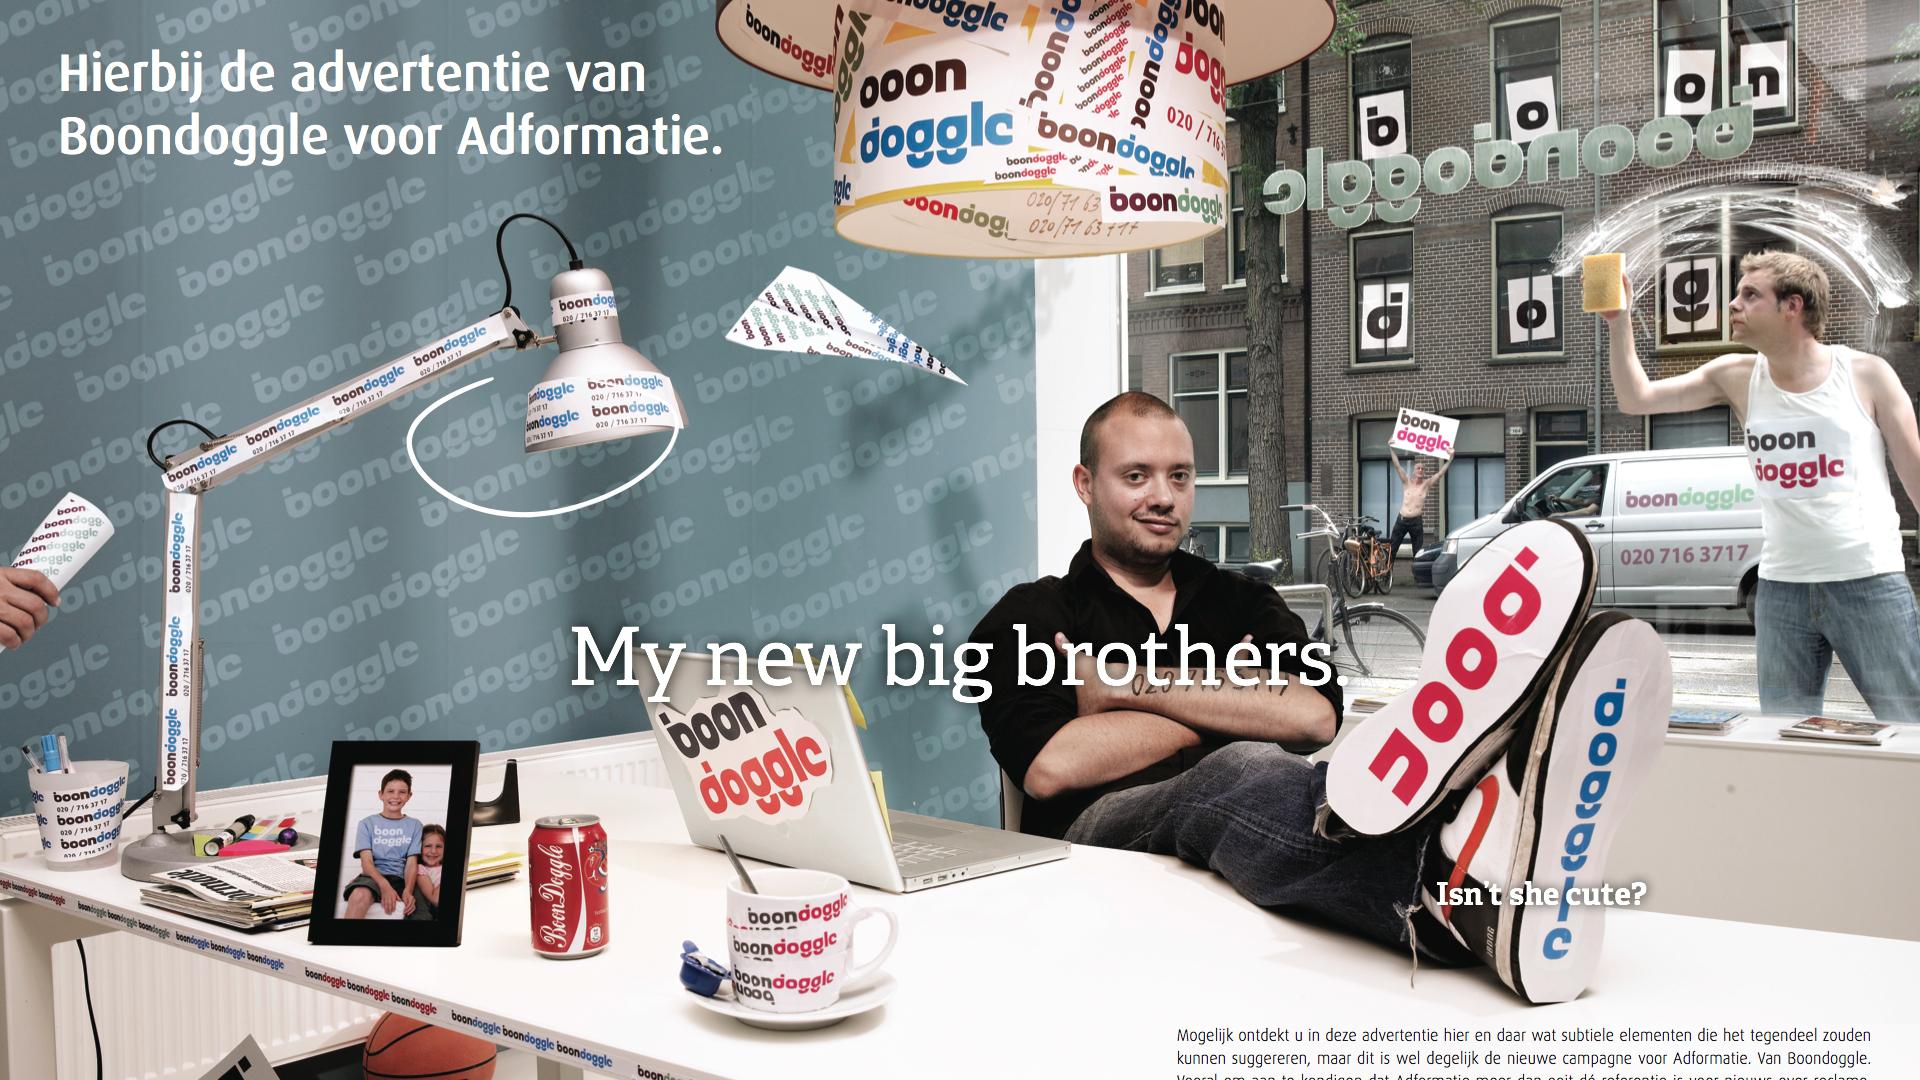 Boondoggle Amsterdam